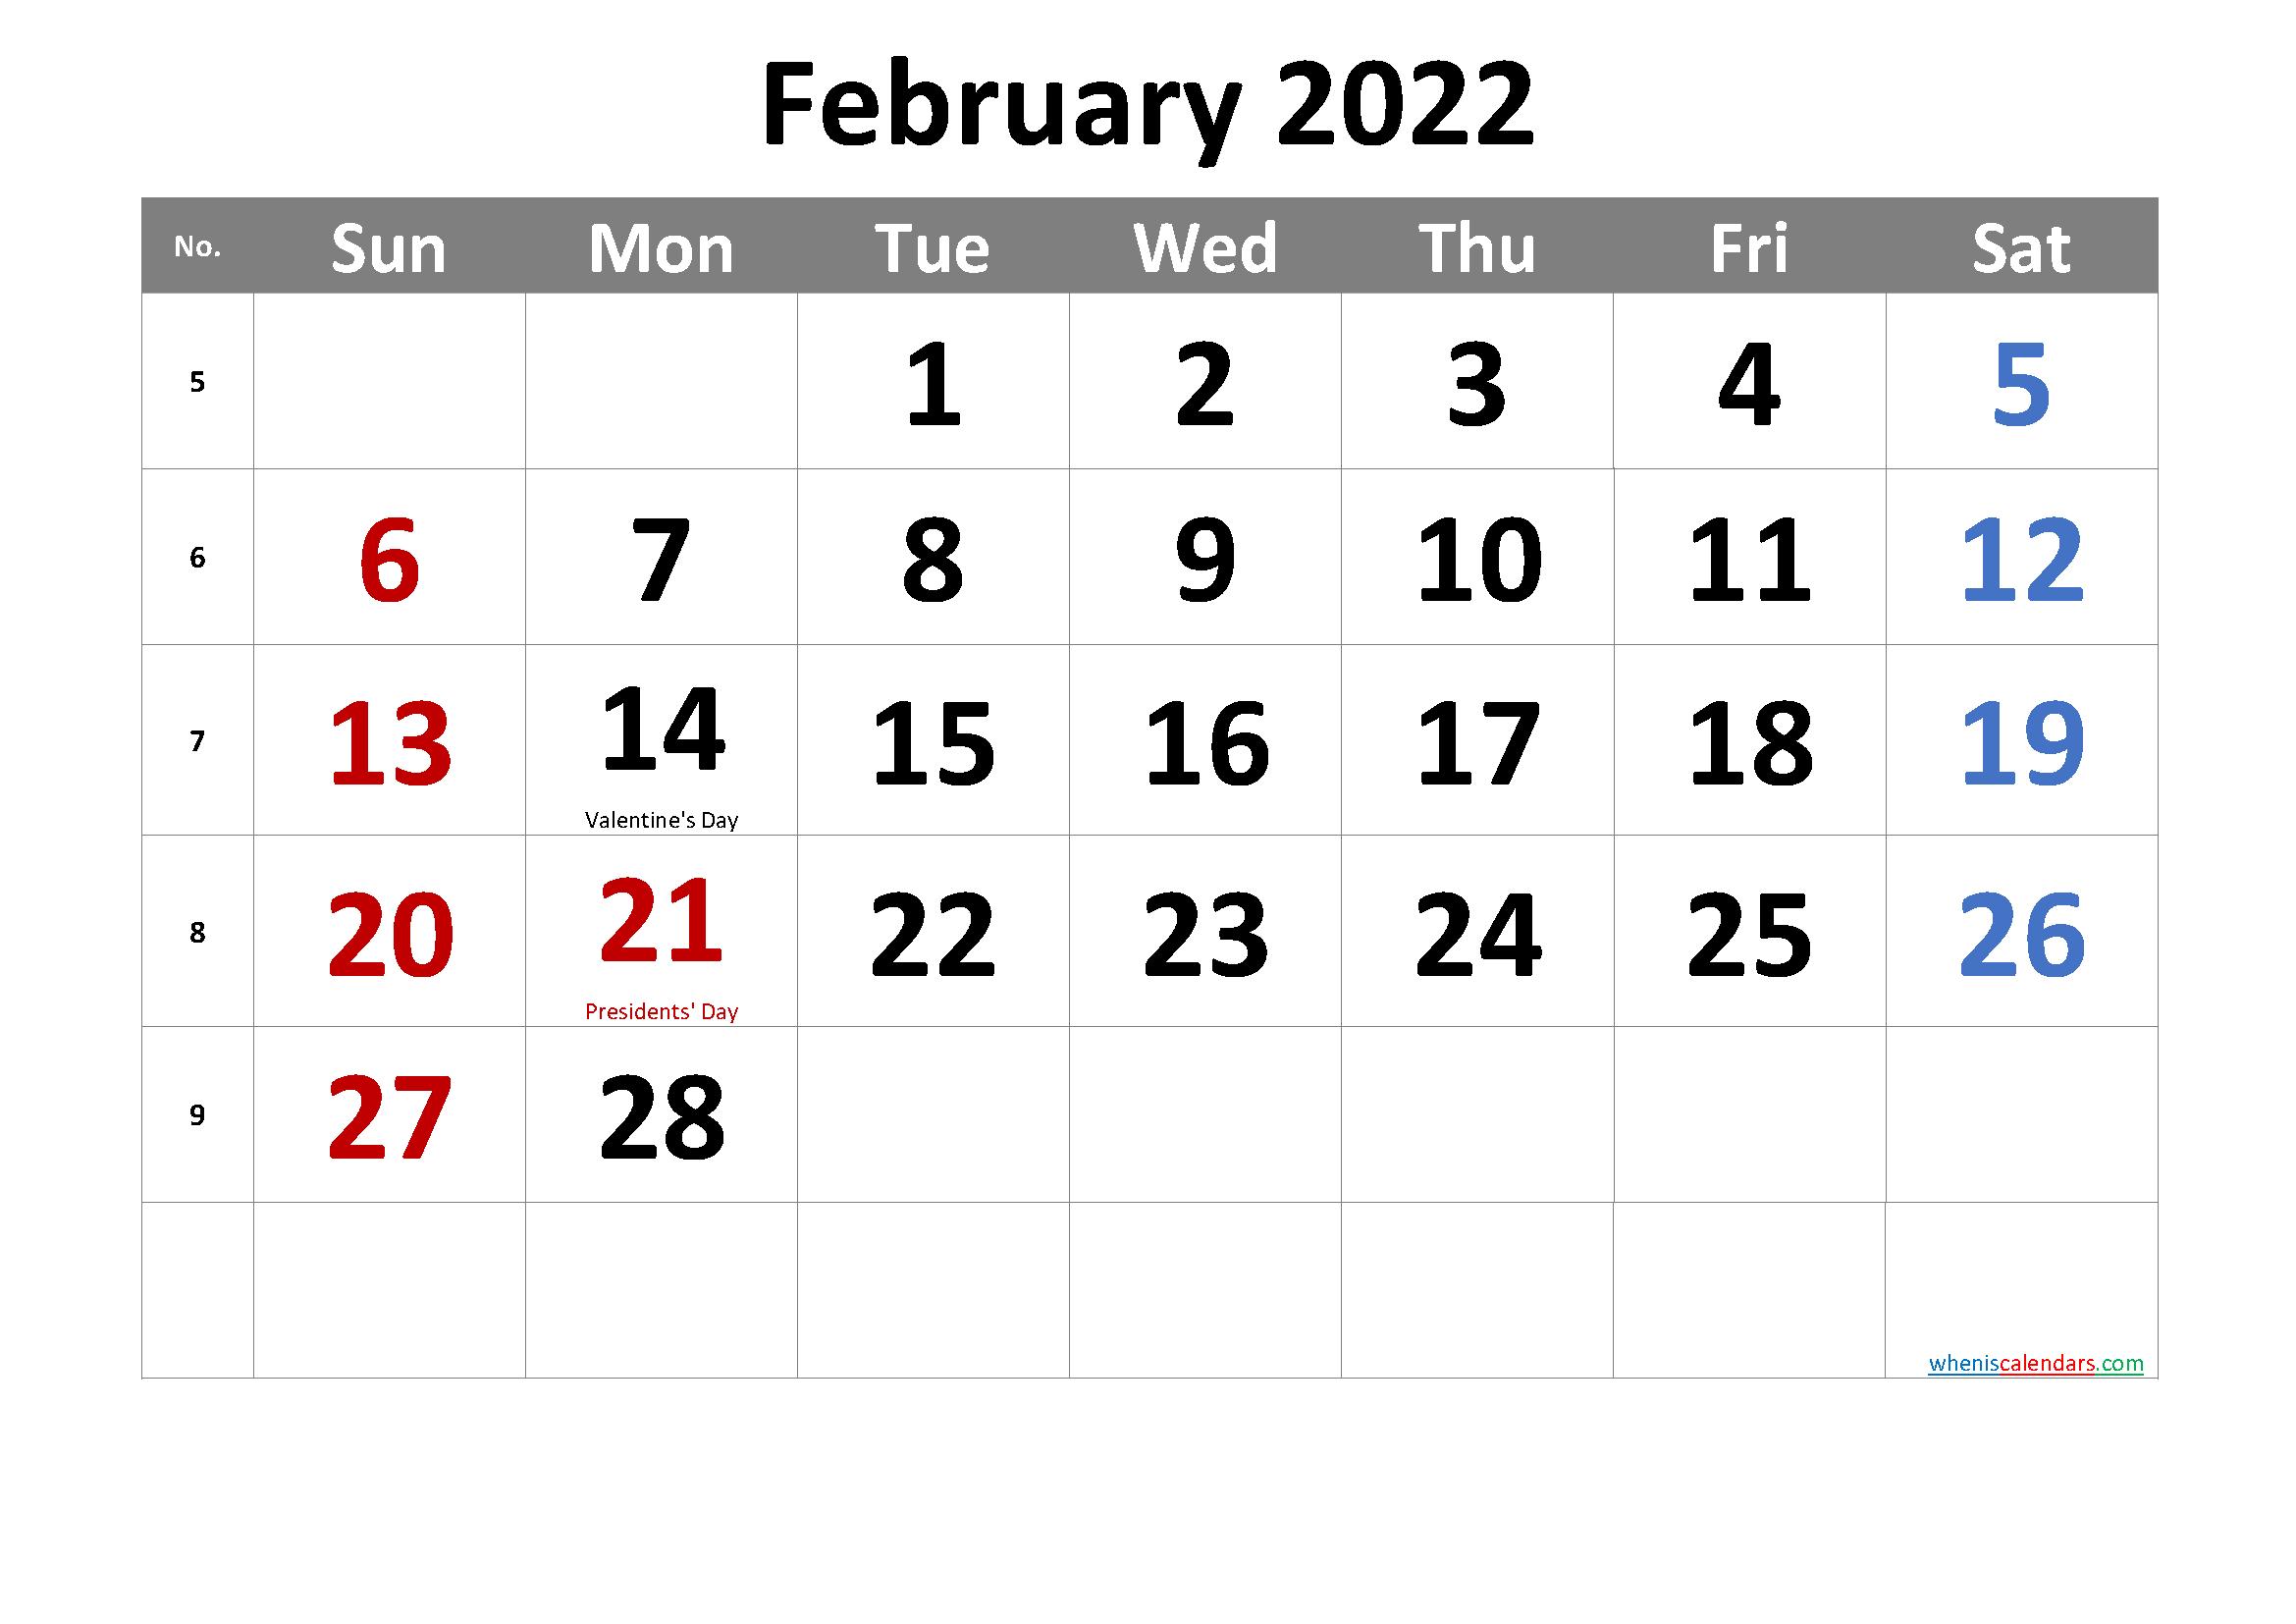 Free Printable February 2022 Calendar Intended For February 2022 Calendar Printable